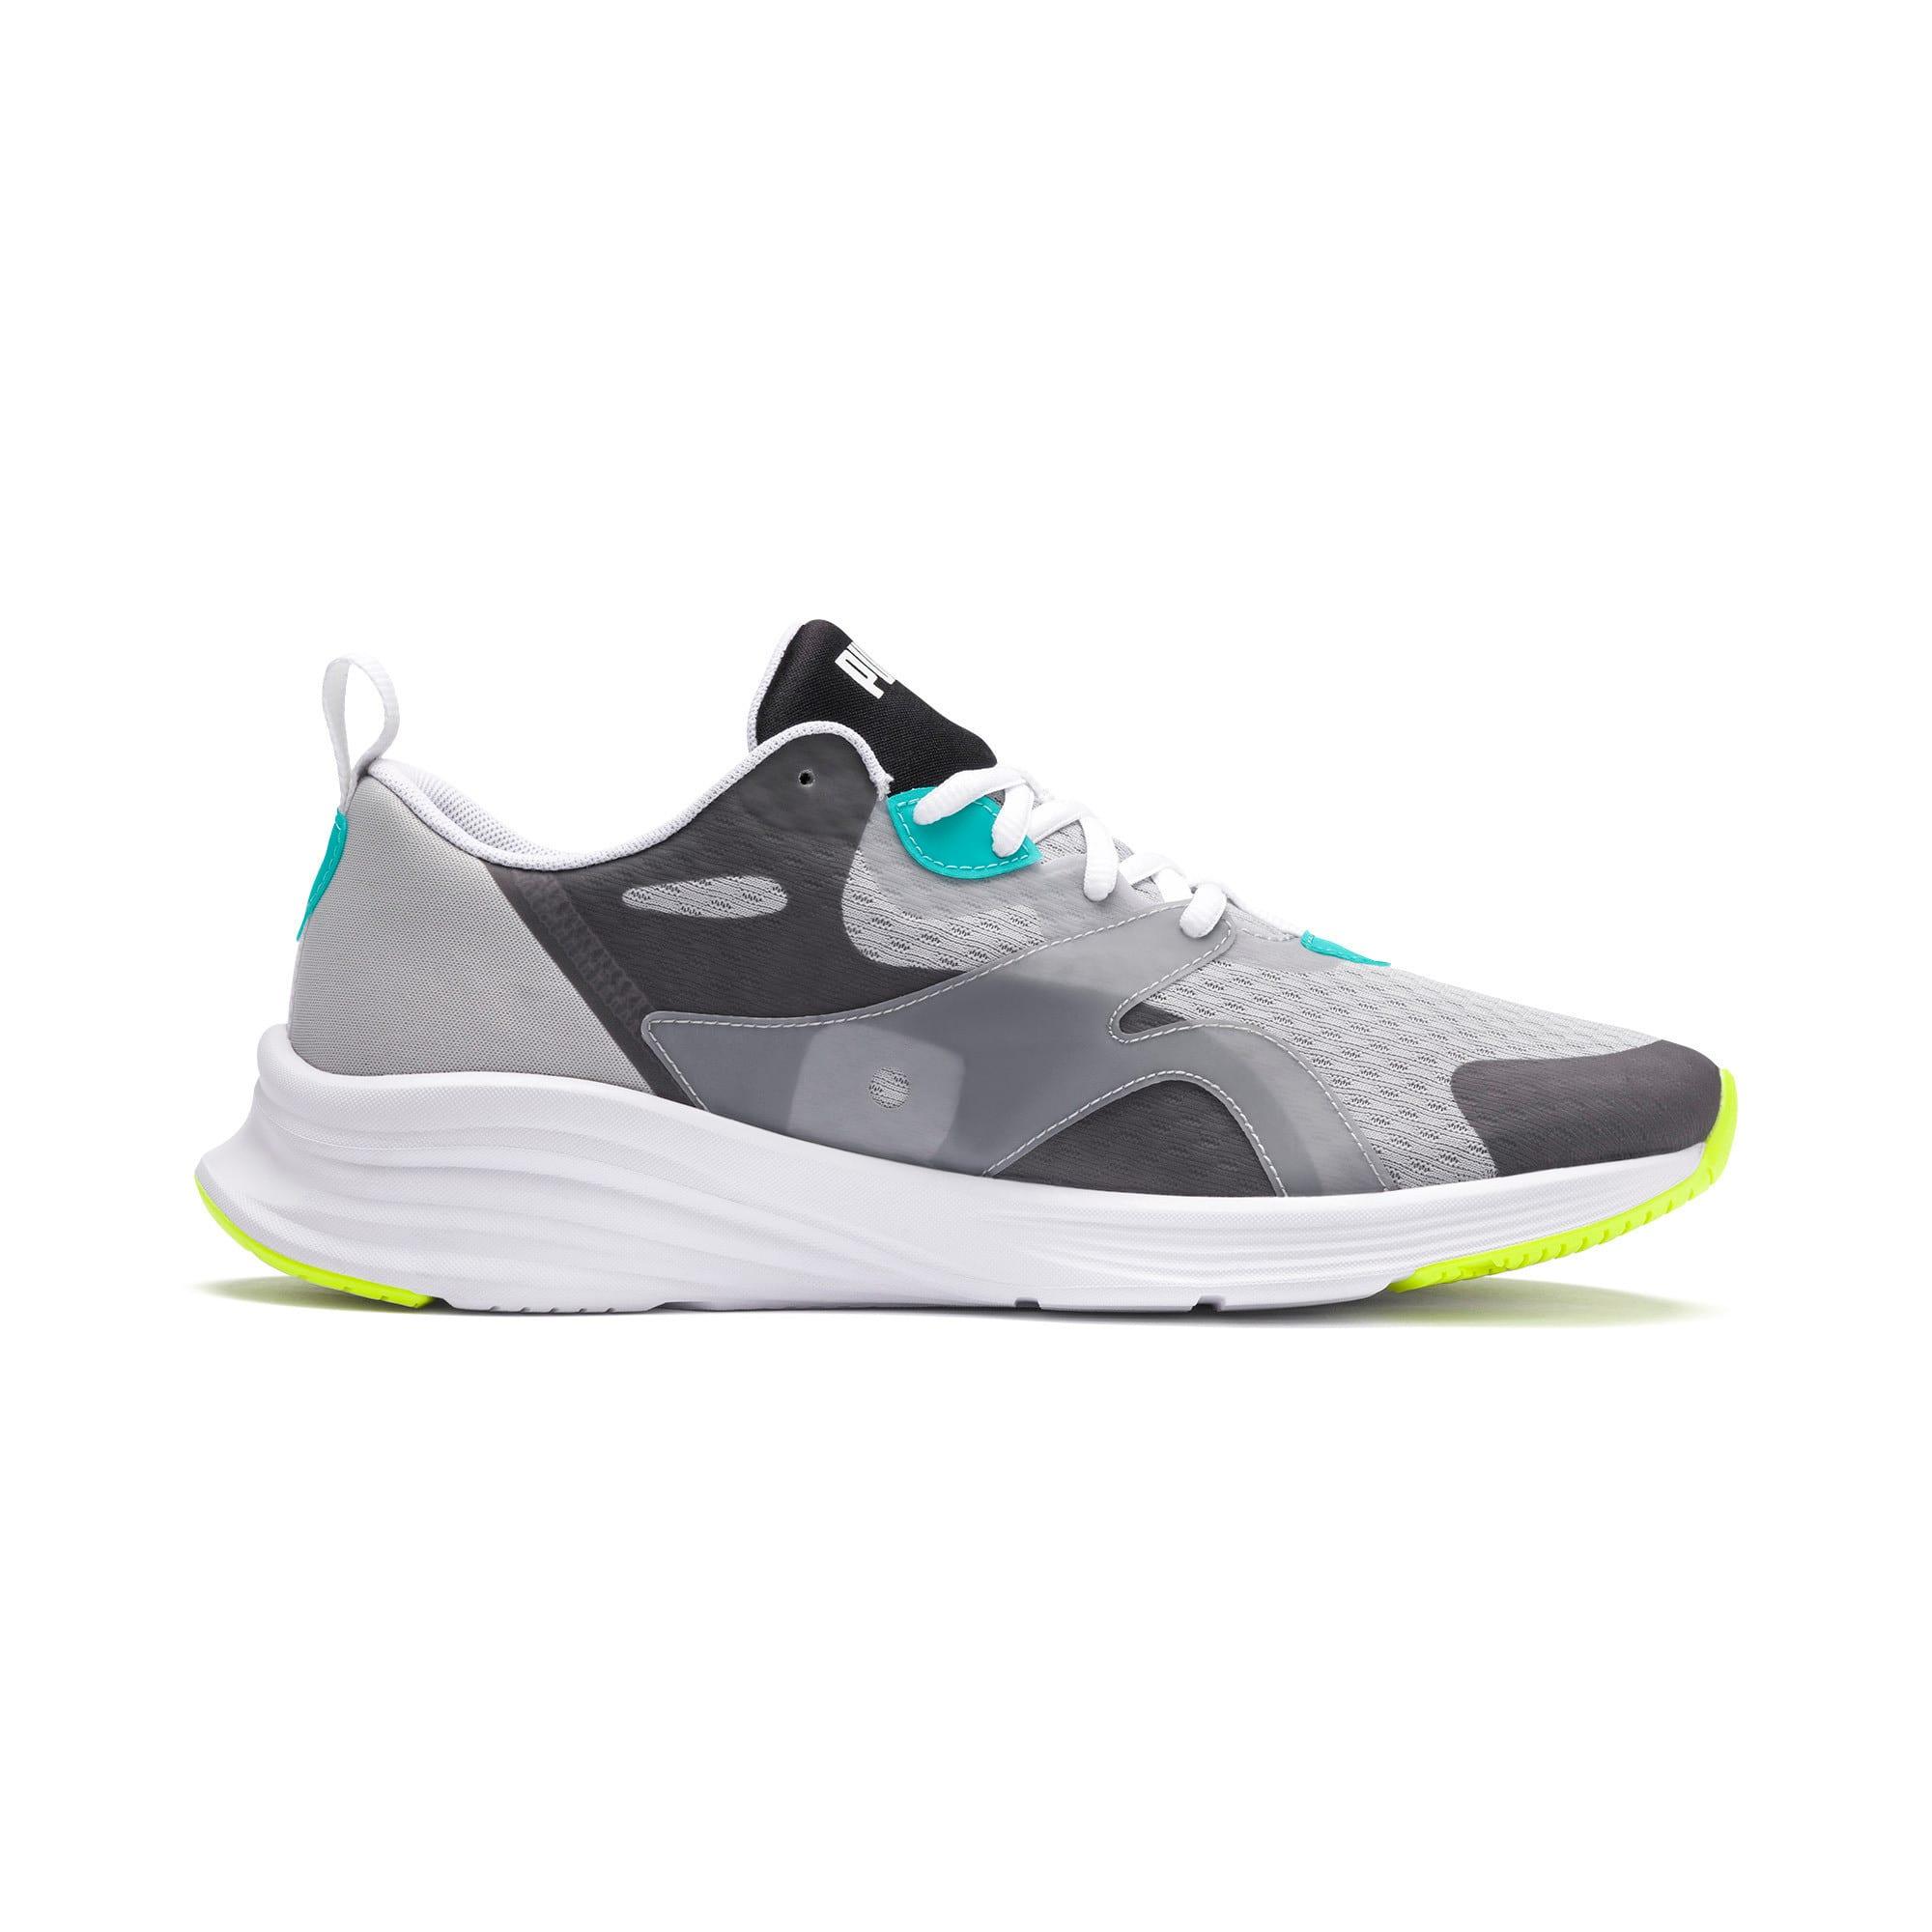 Miniatura 5 de Zapatos para correr HYBRID Fuego para hombre, High Rise-Blue Turquoise, mediano